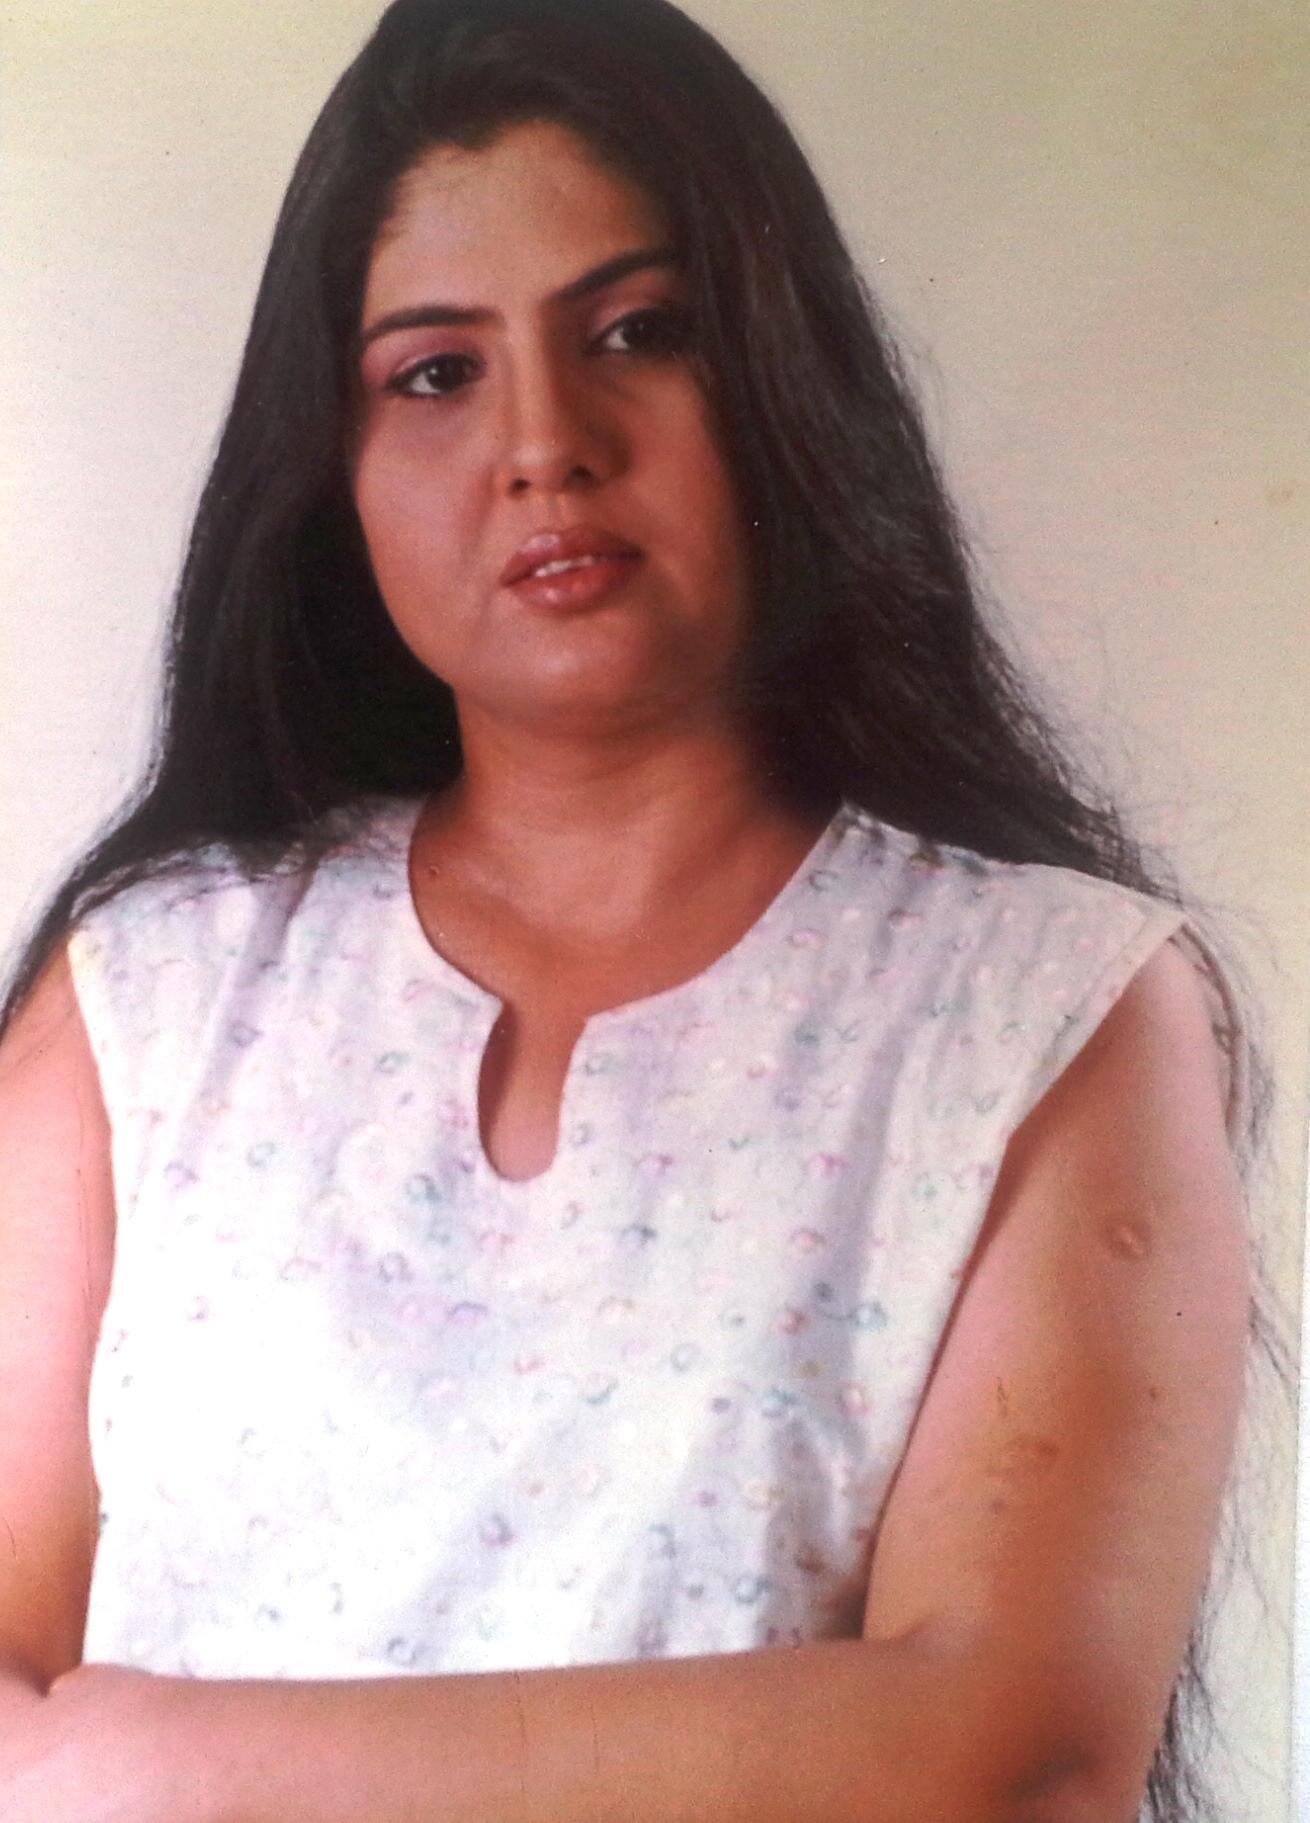 Smithaa M Chaturvedi